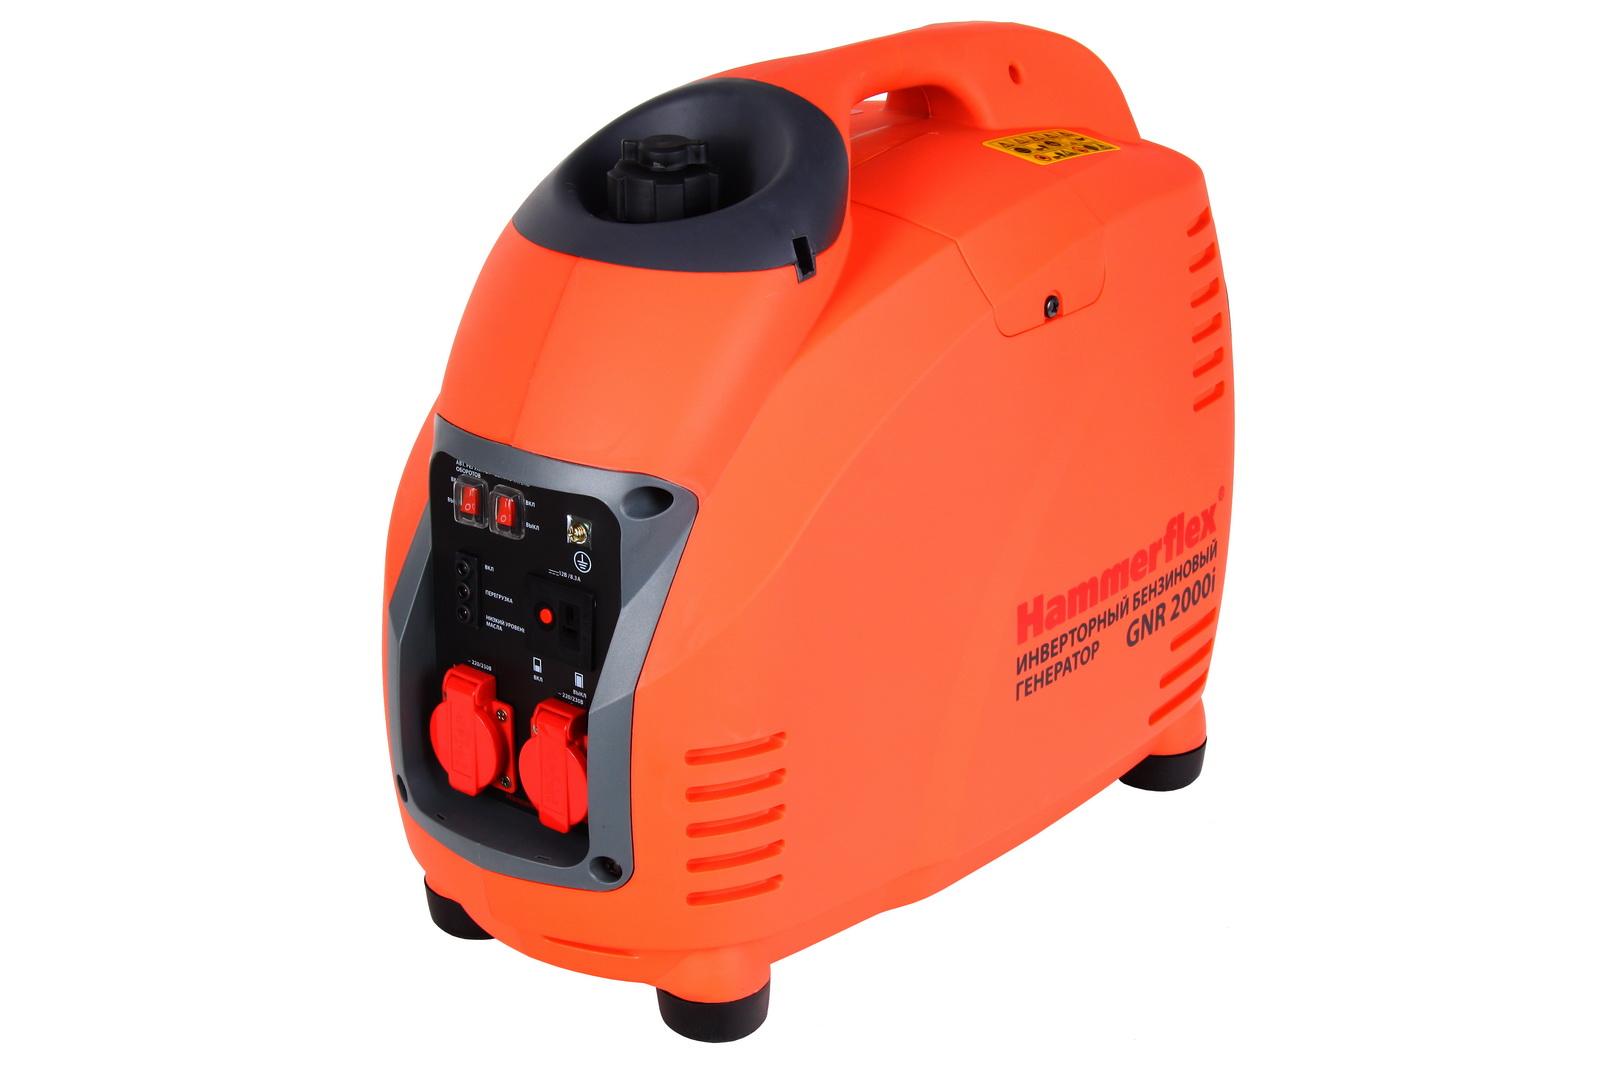 Бензиновый инверторный генератор Hammer Gnr2000i